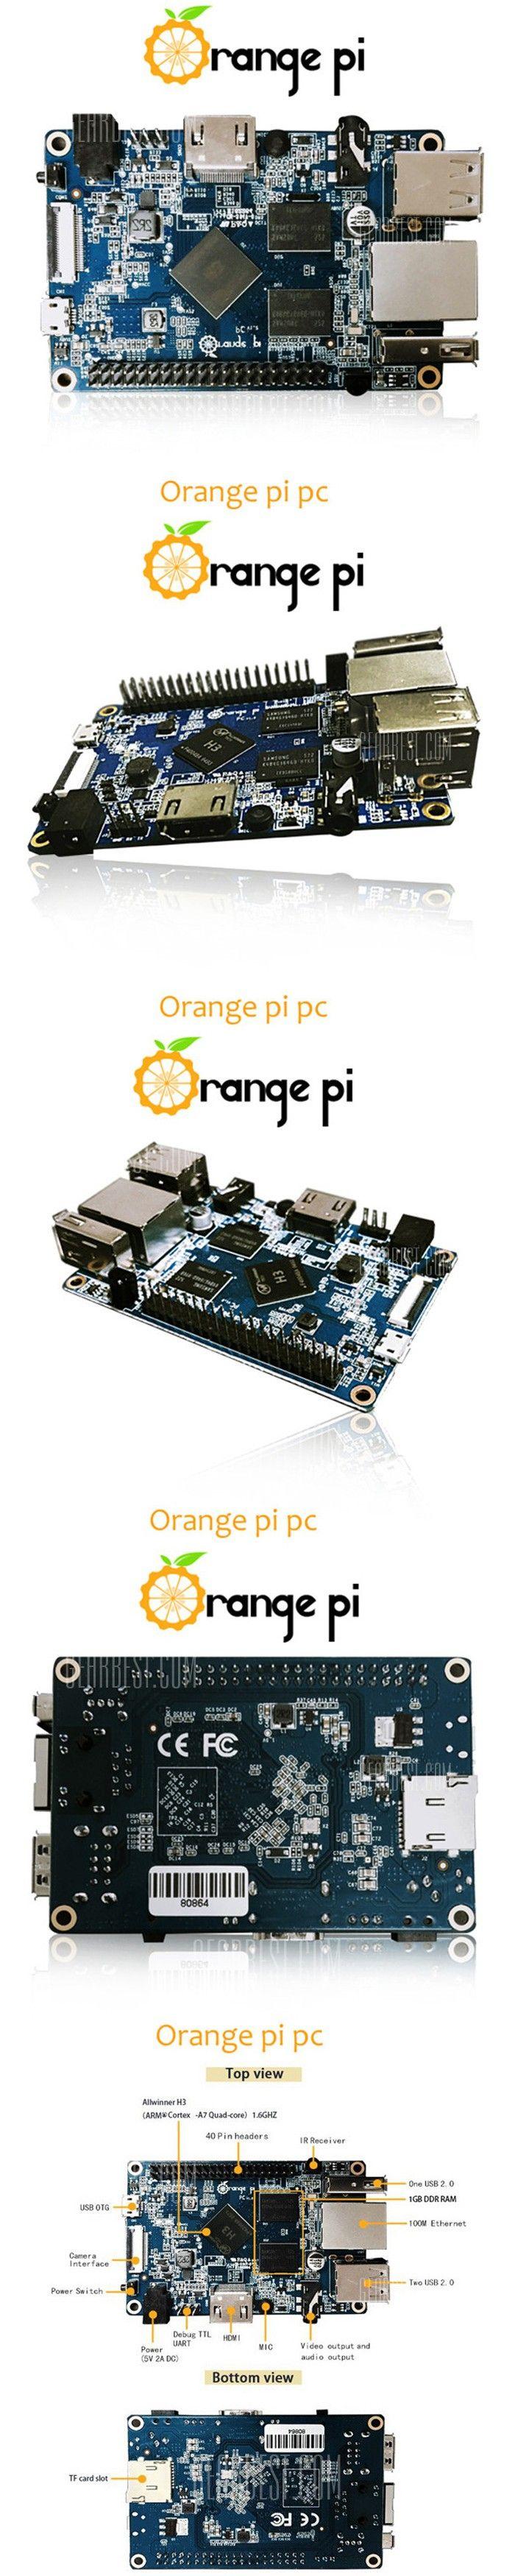 129 Best Electronics Images On Pinterest Diy Pi Cnc Projects Buy Alamode Controller Calculator Raspberry Orange Pc H3 Quad Core Learning Development Board Mali400mp2 Gpu 1gb Ddr3 Support 100m